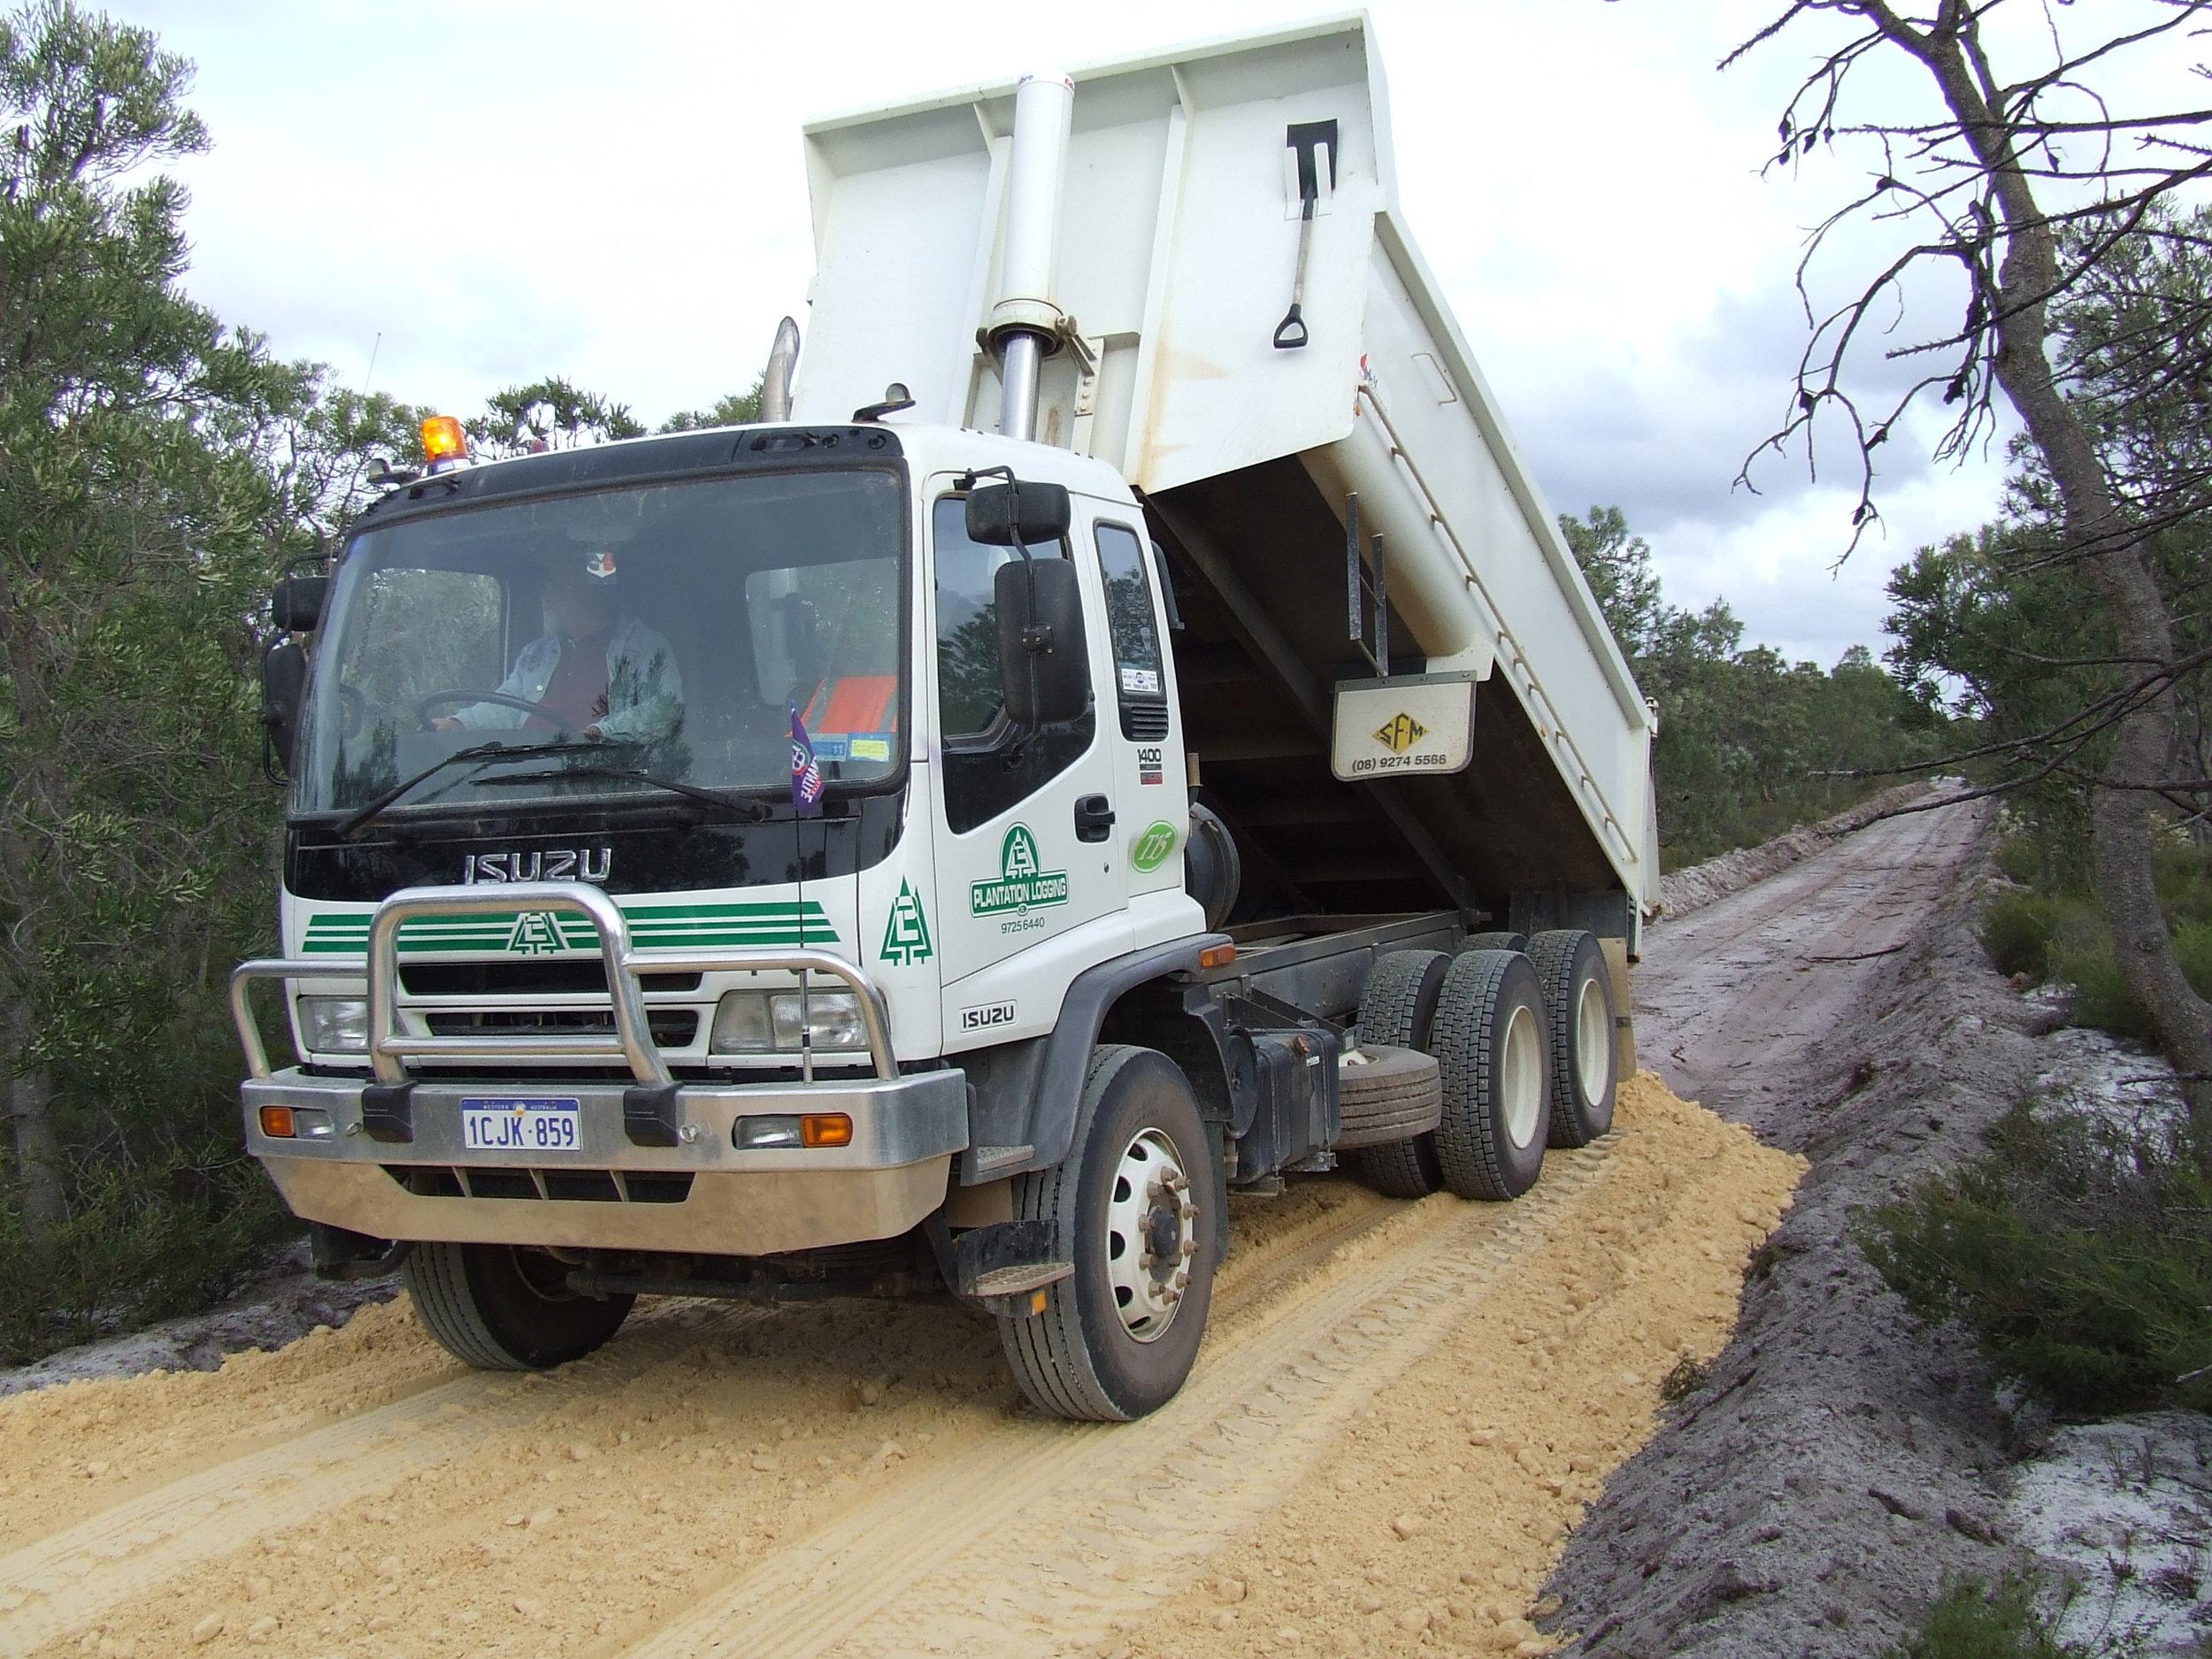 6wh truck2.JPG